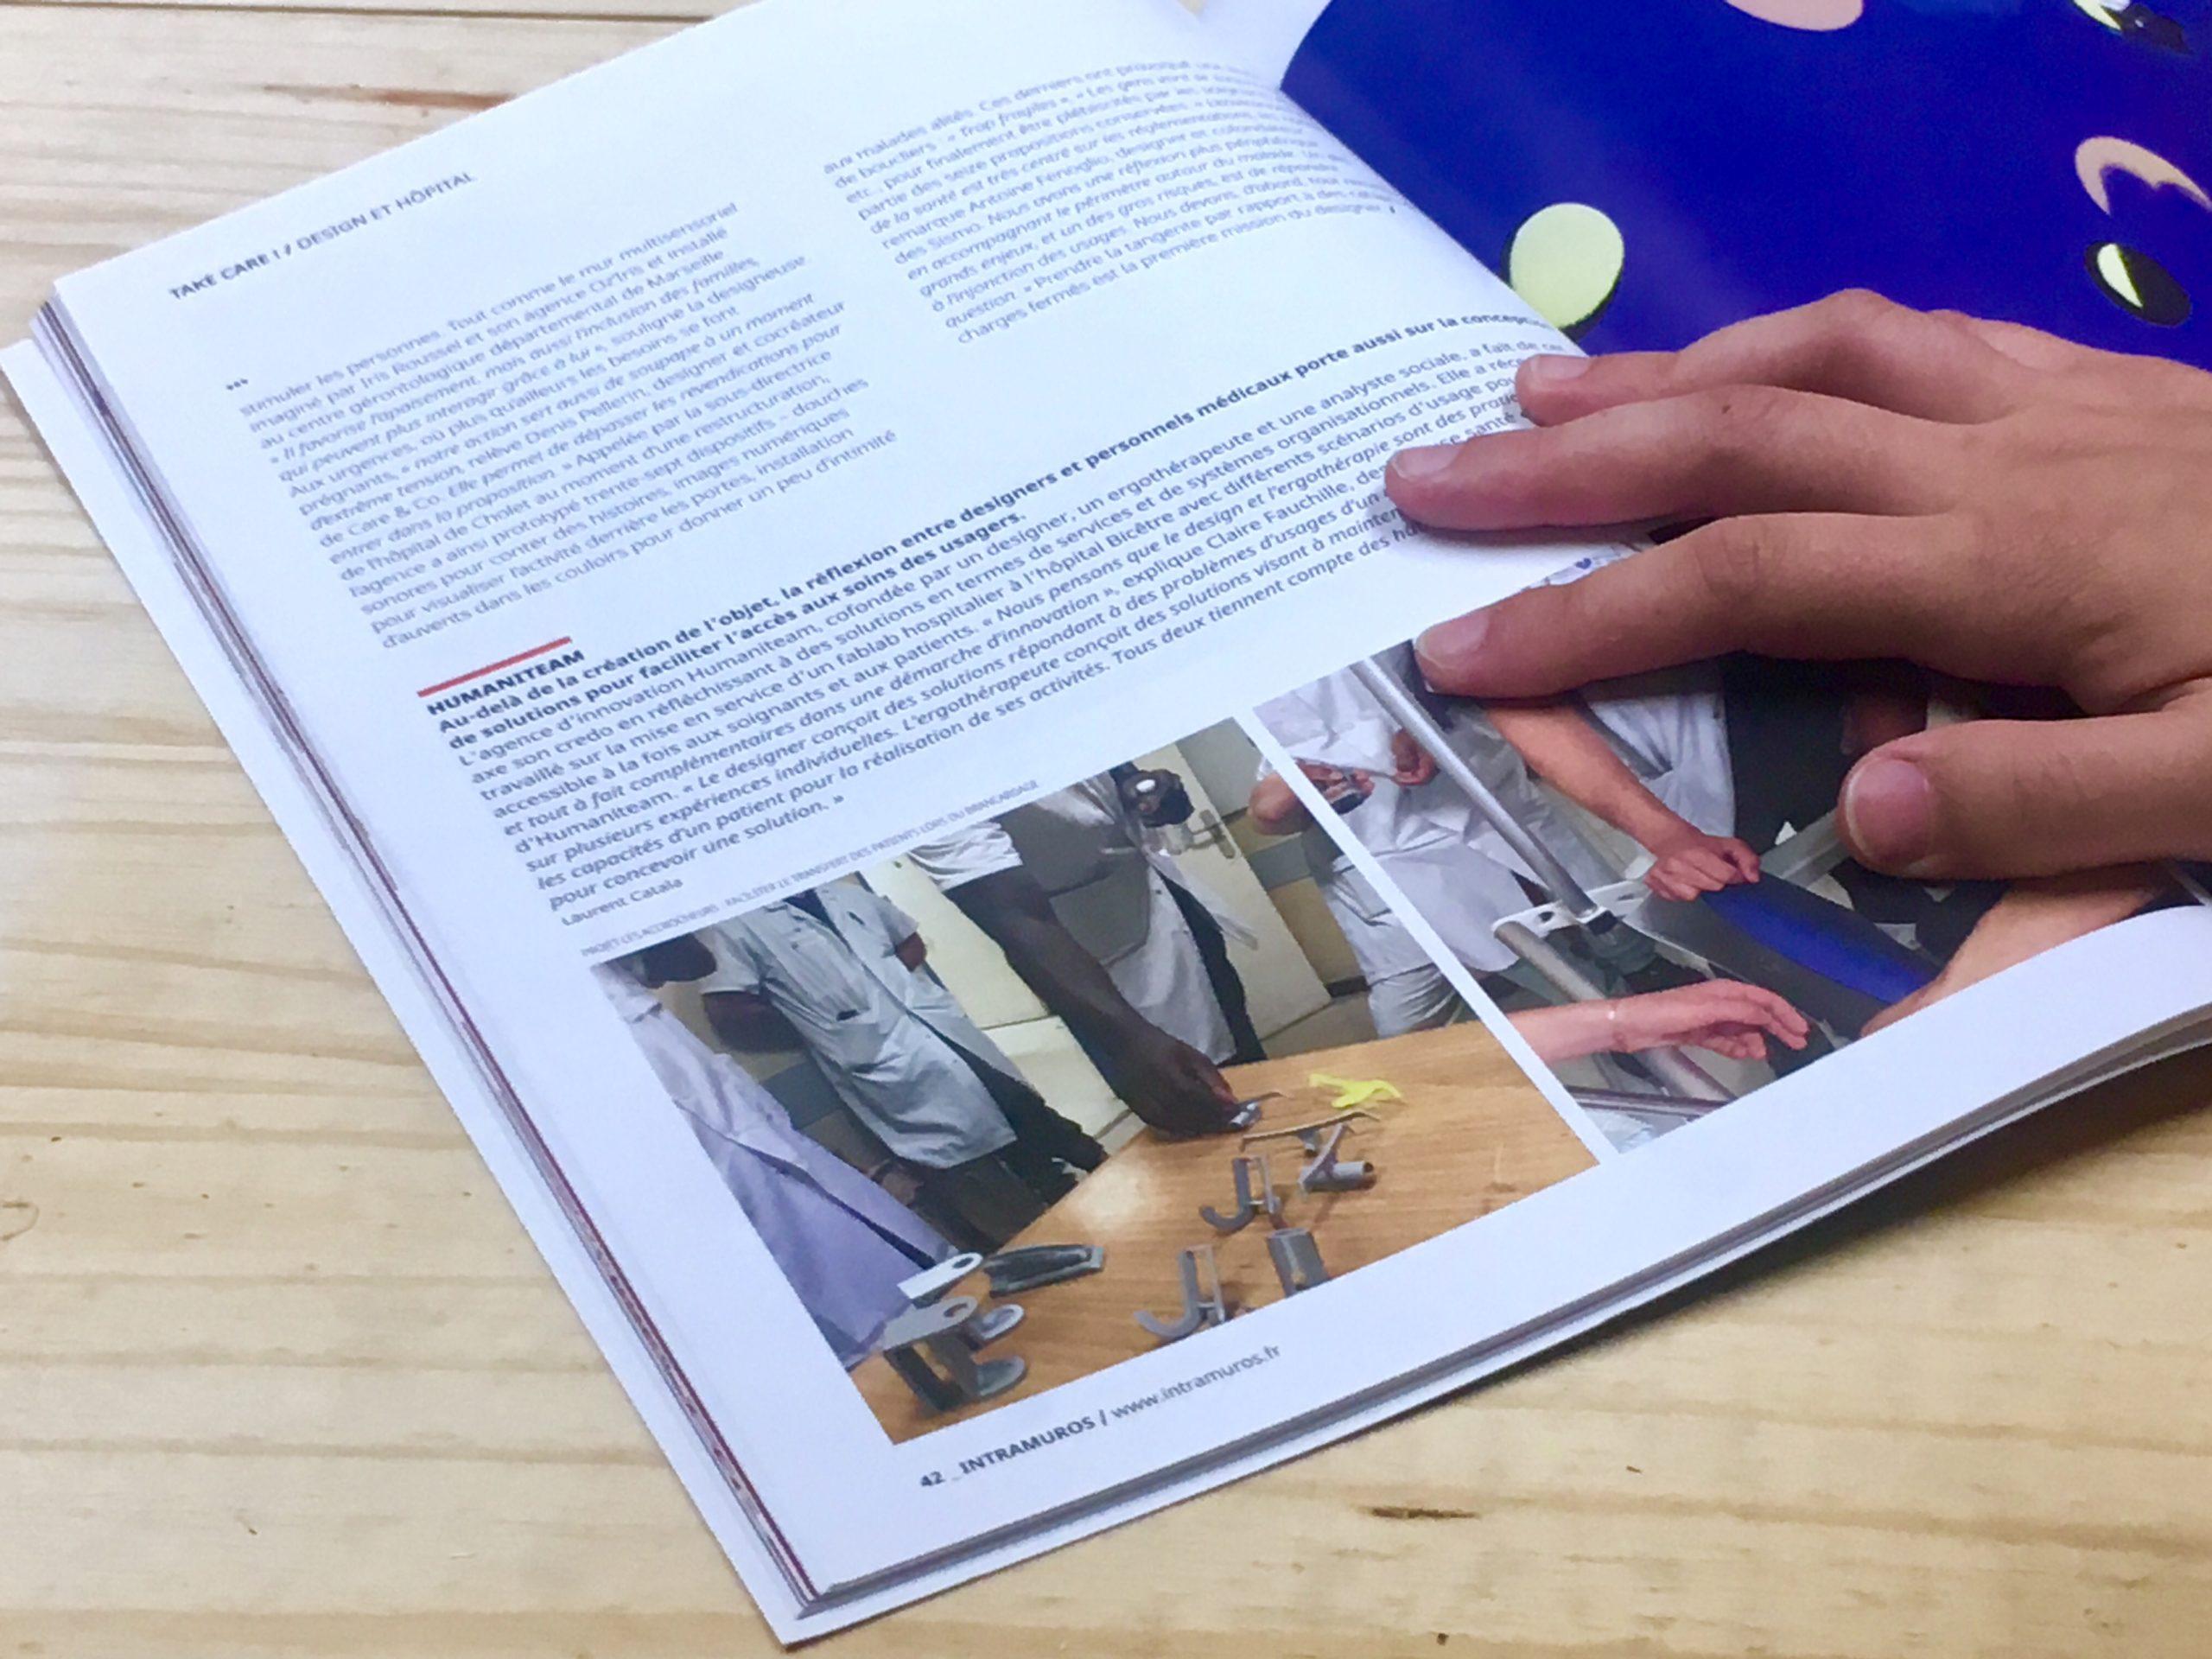 Magazine Intramuros